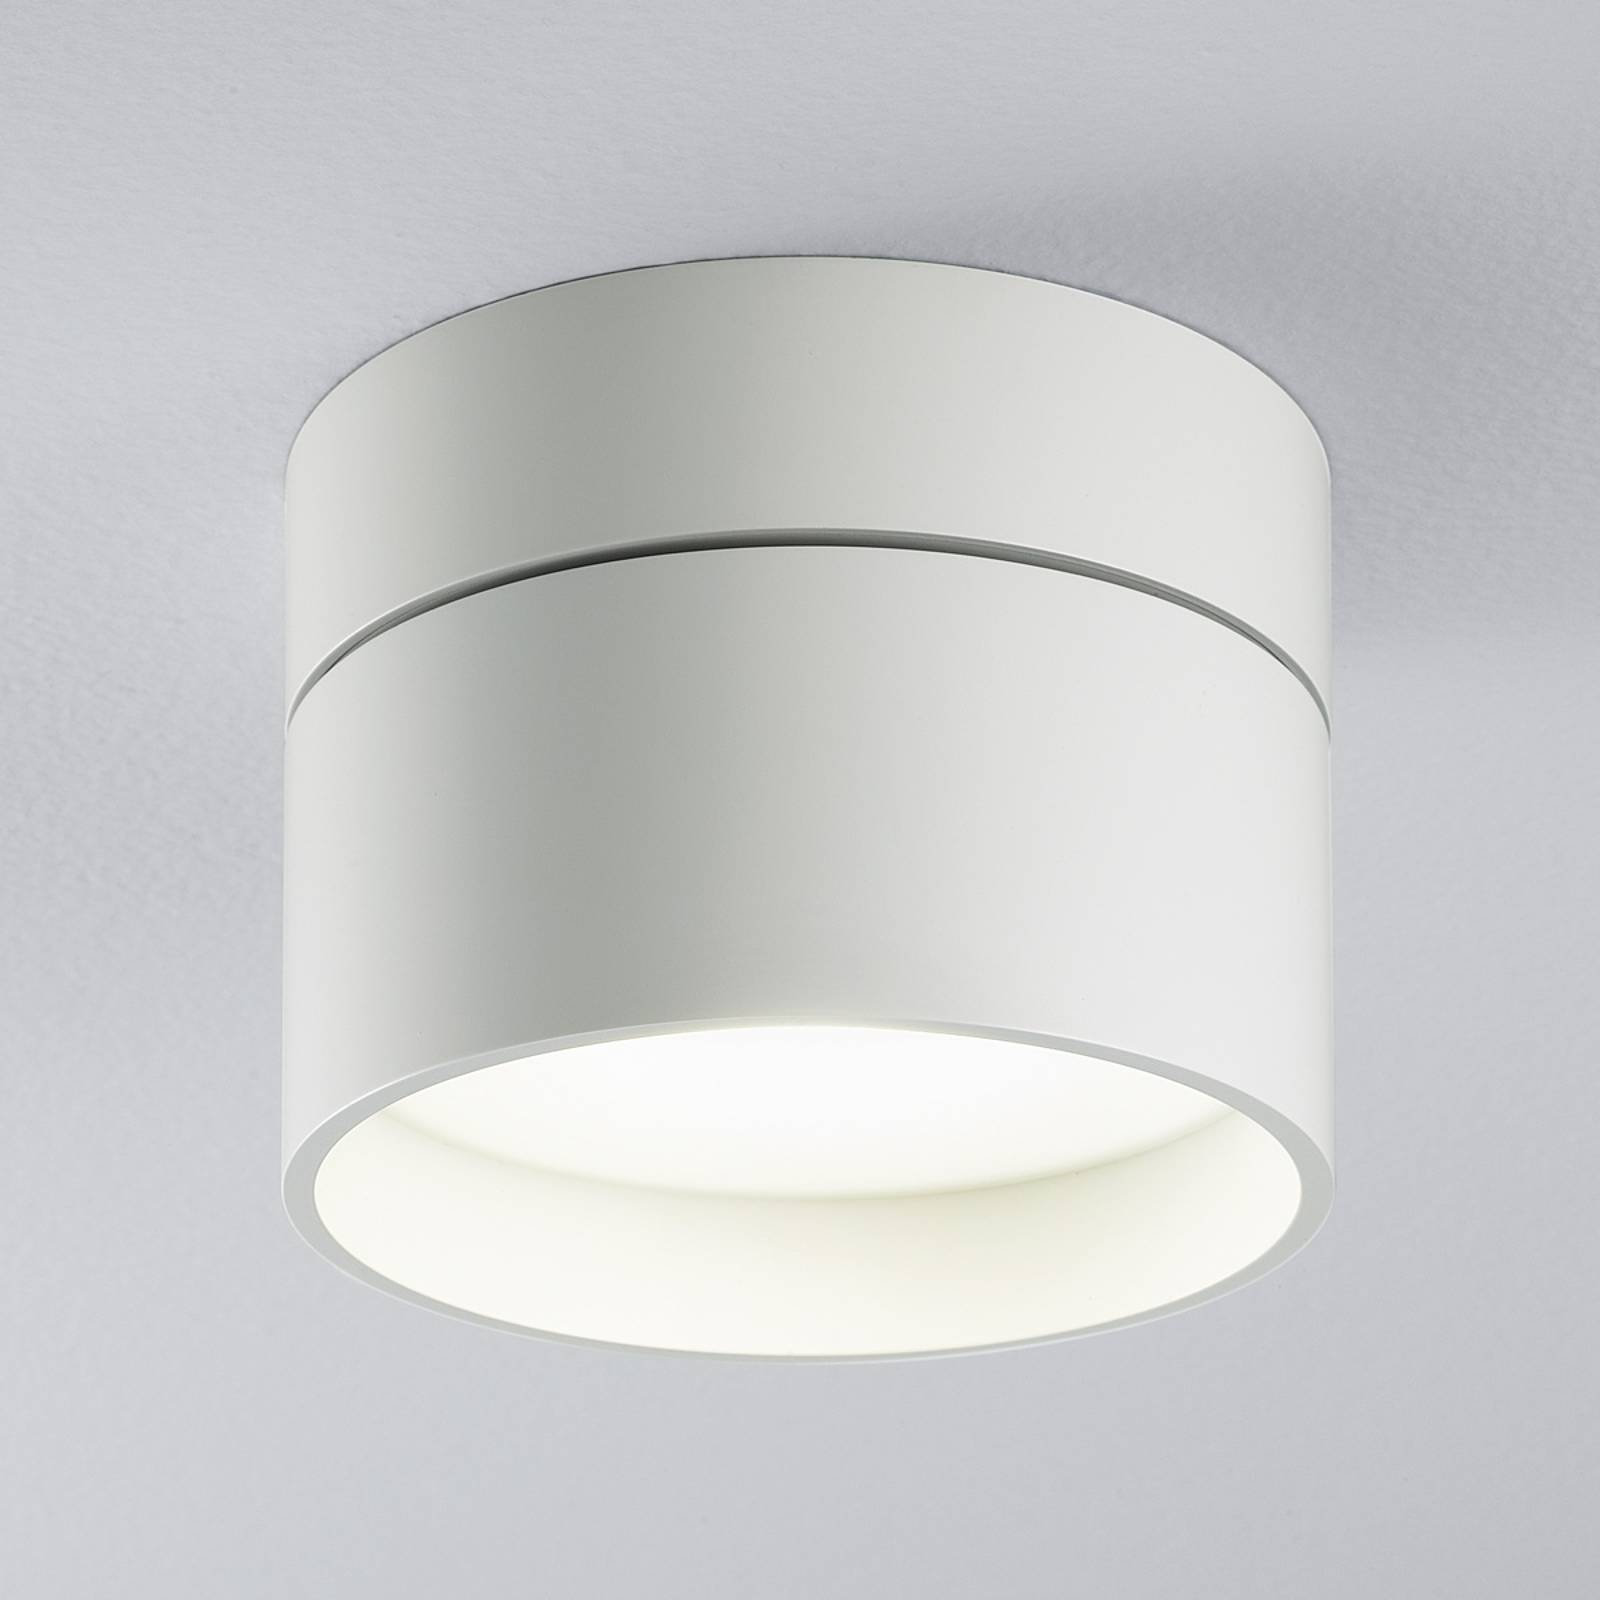 LED-kattovalaisin Piper, 15 cm